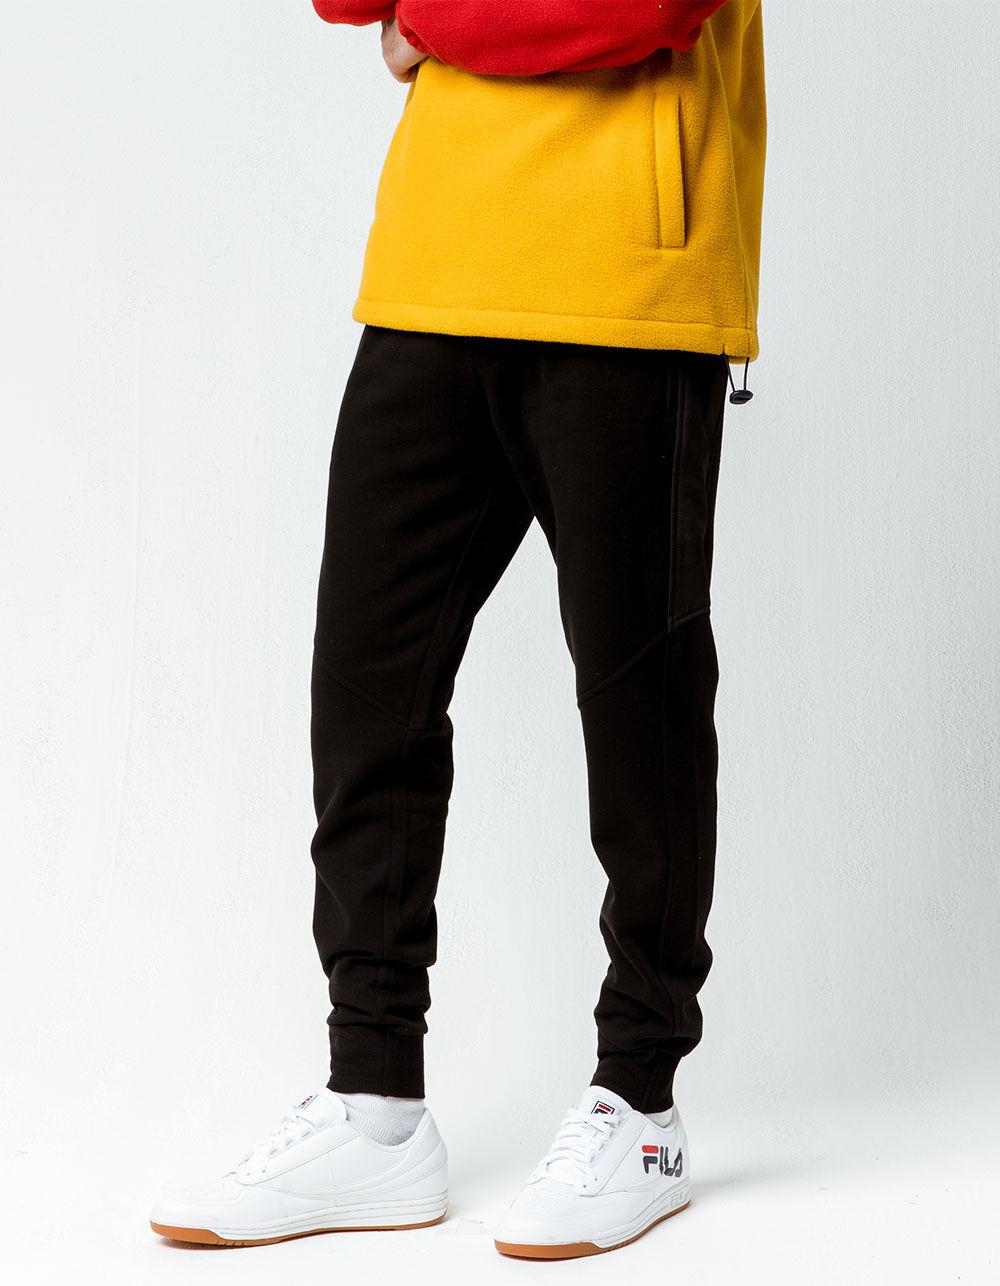 Image of BROOKLYN CLOTH NYLON BLACK STREAK BLACK JOGGER PANTS